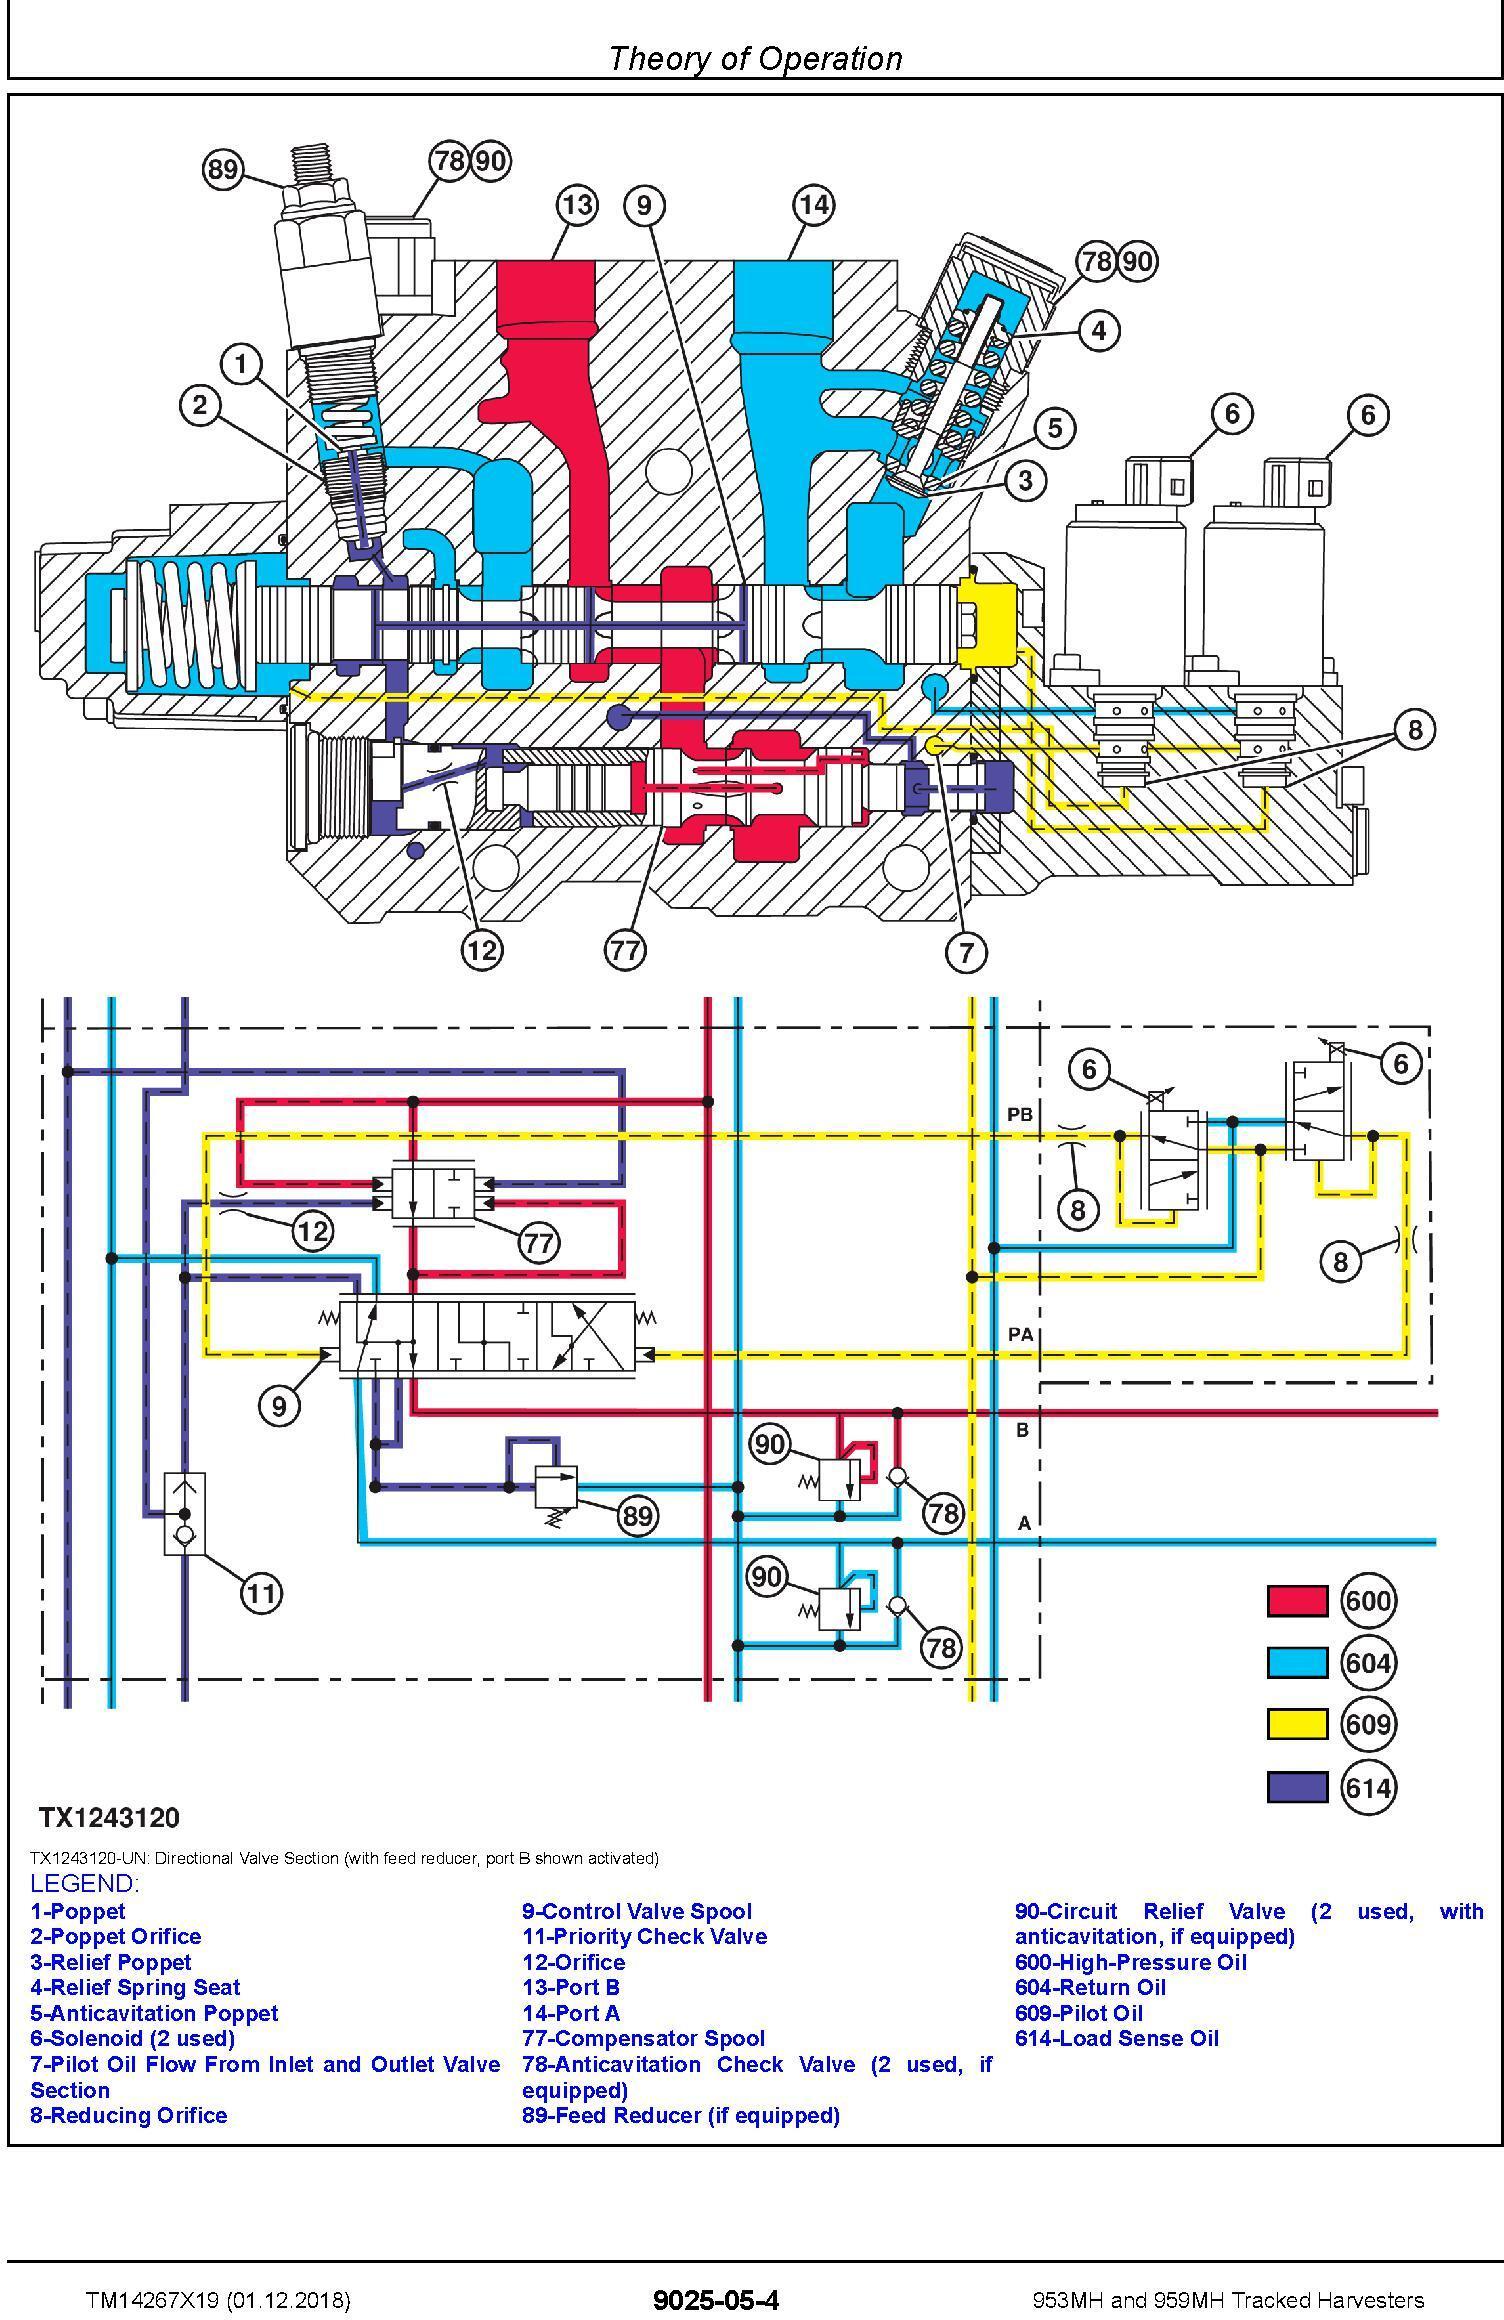 John Deere 953MH, 959MH (SN. C317982-, D317982-) Tracked Harvesters Diagnostic Manual (TM14267X19) - 1